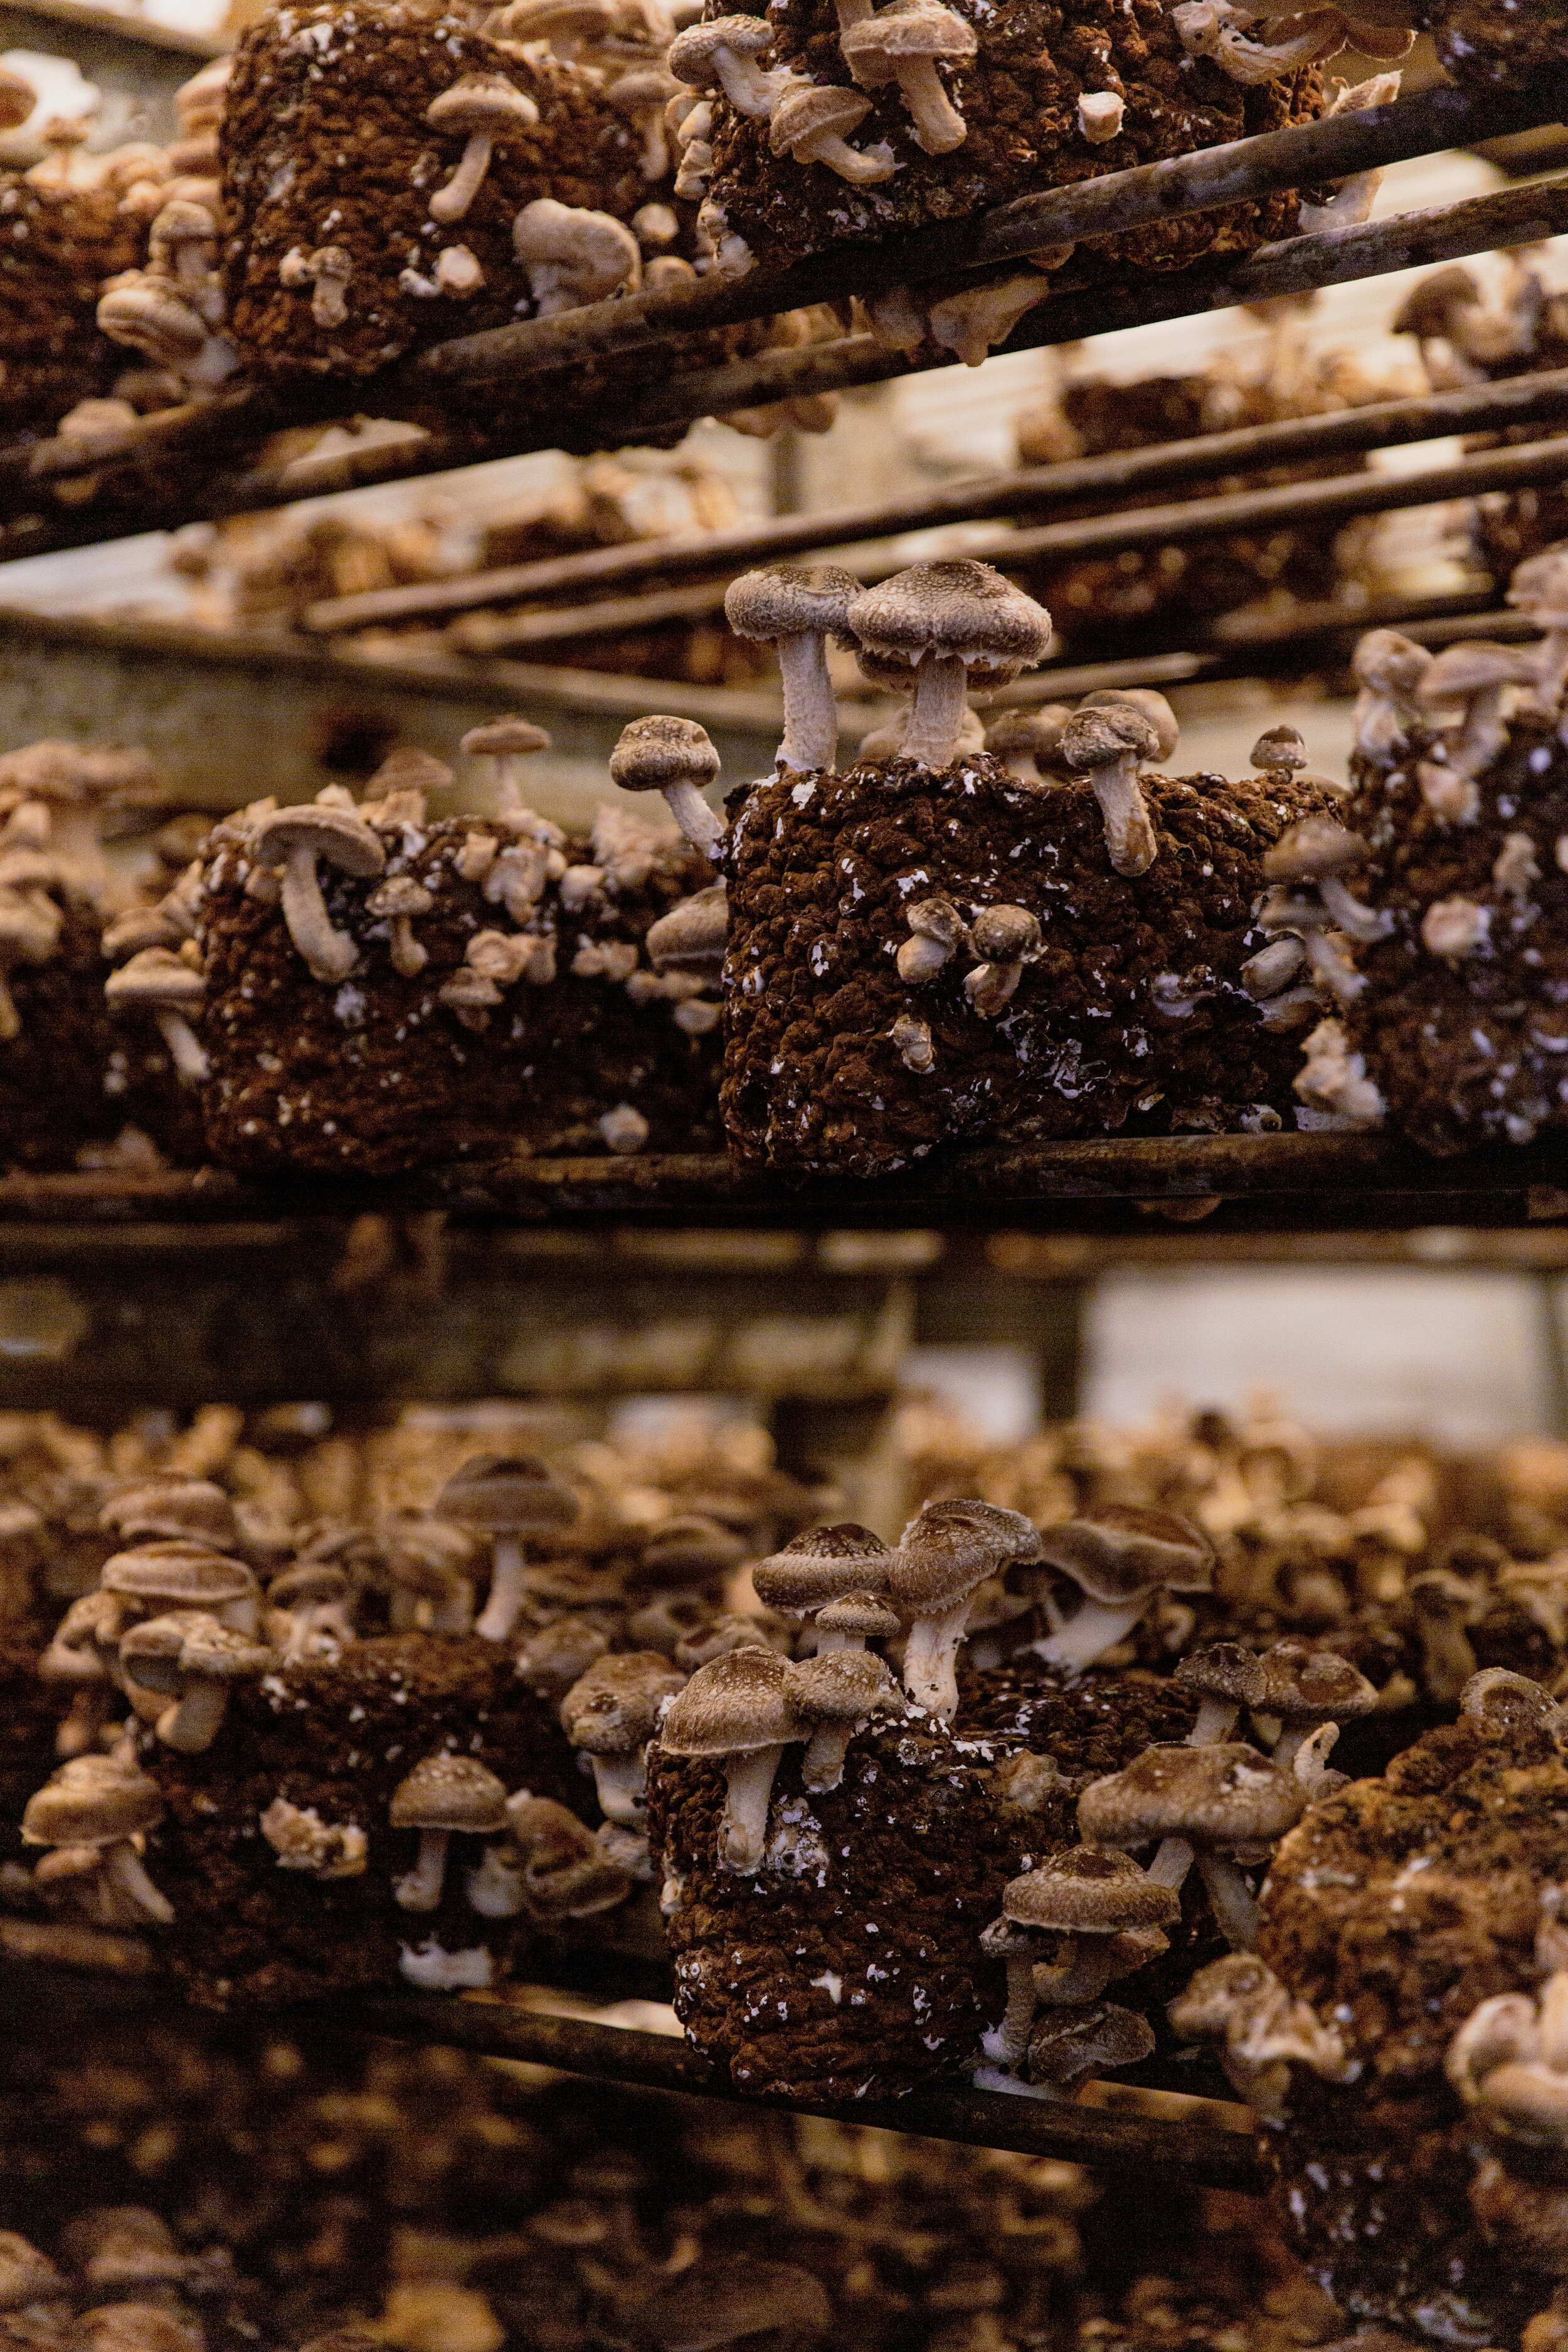 River City Shiitake Mushrooms Portland, Oregon | The Purposeful Plate